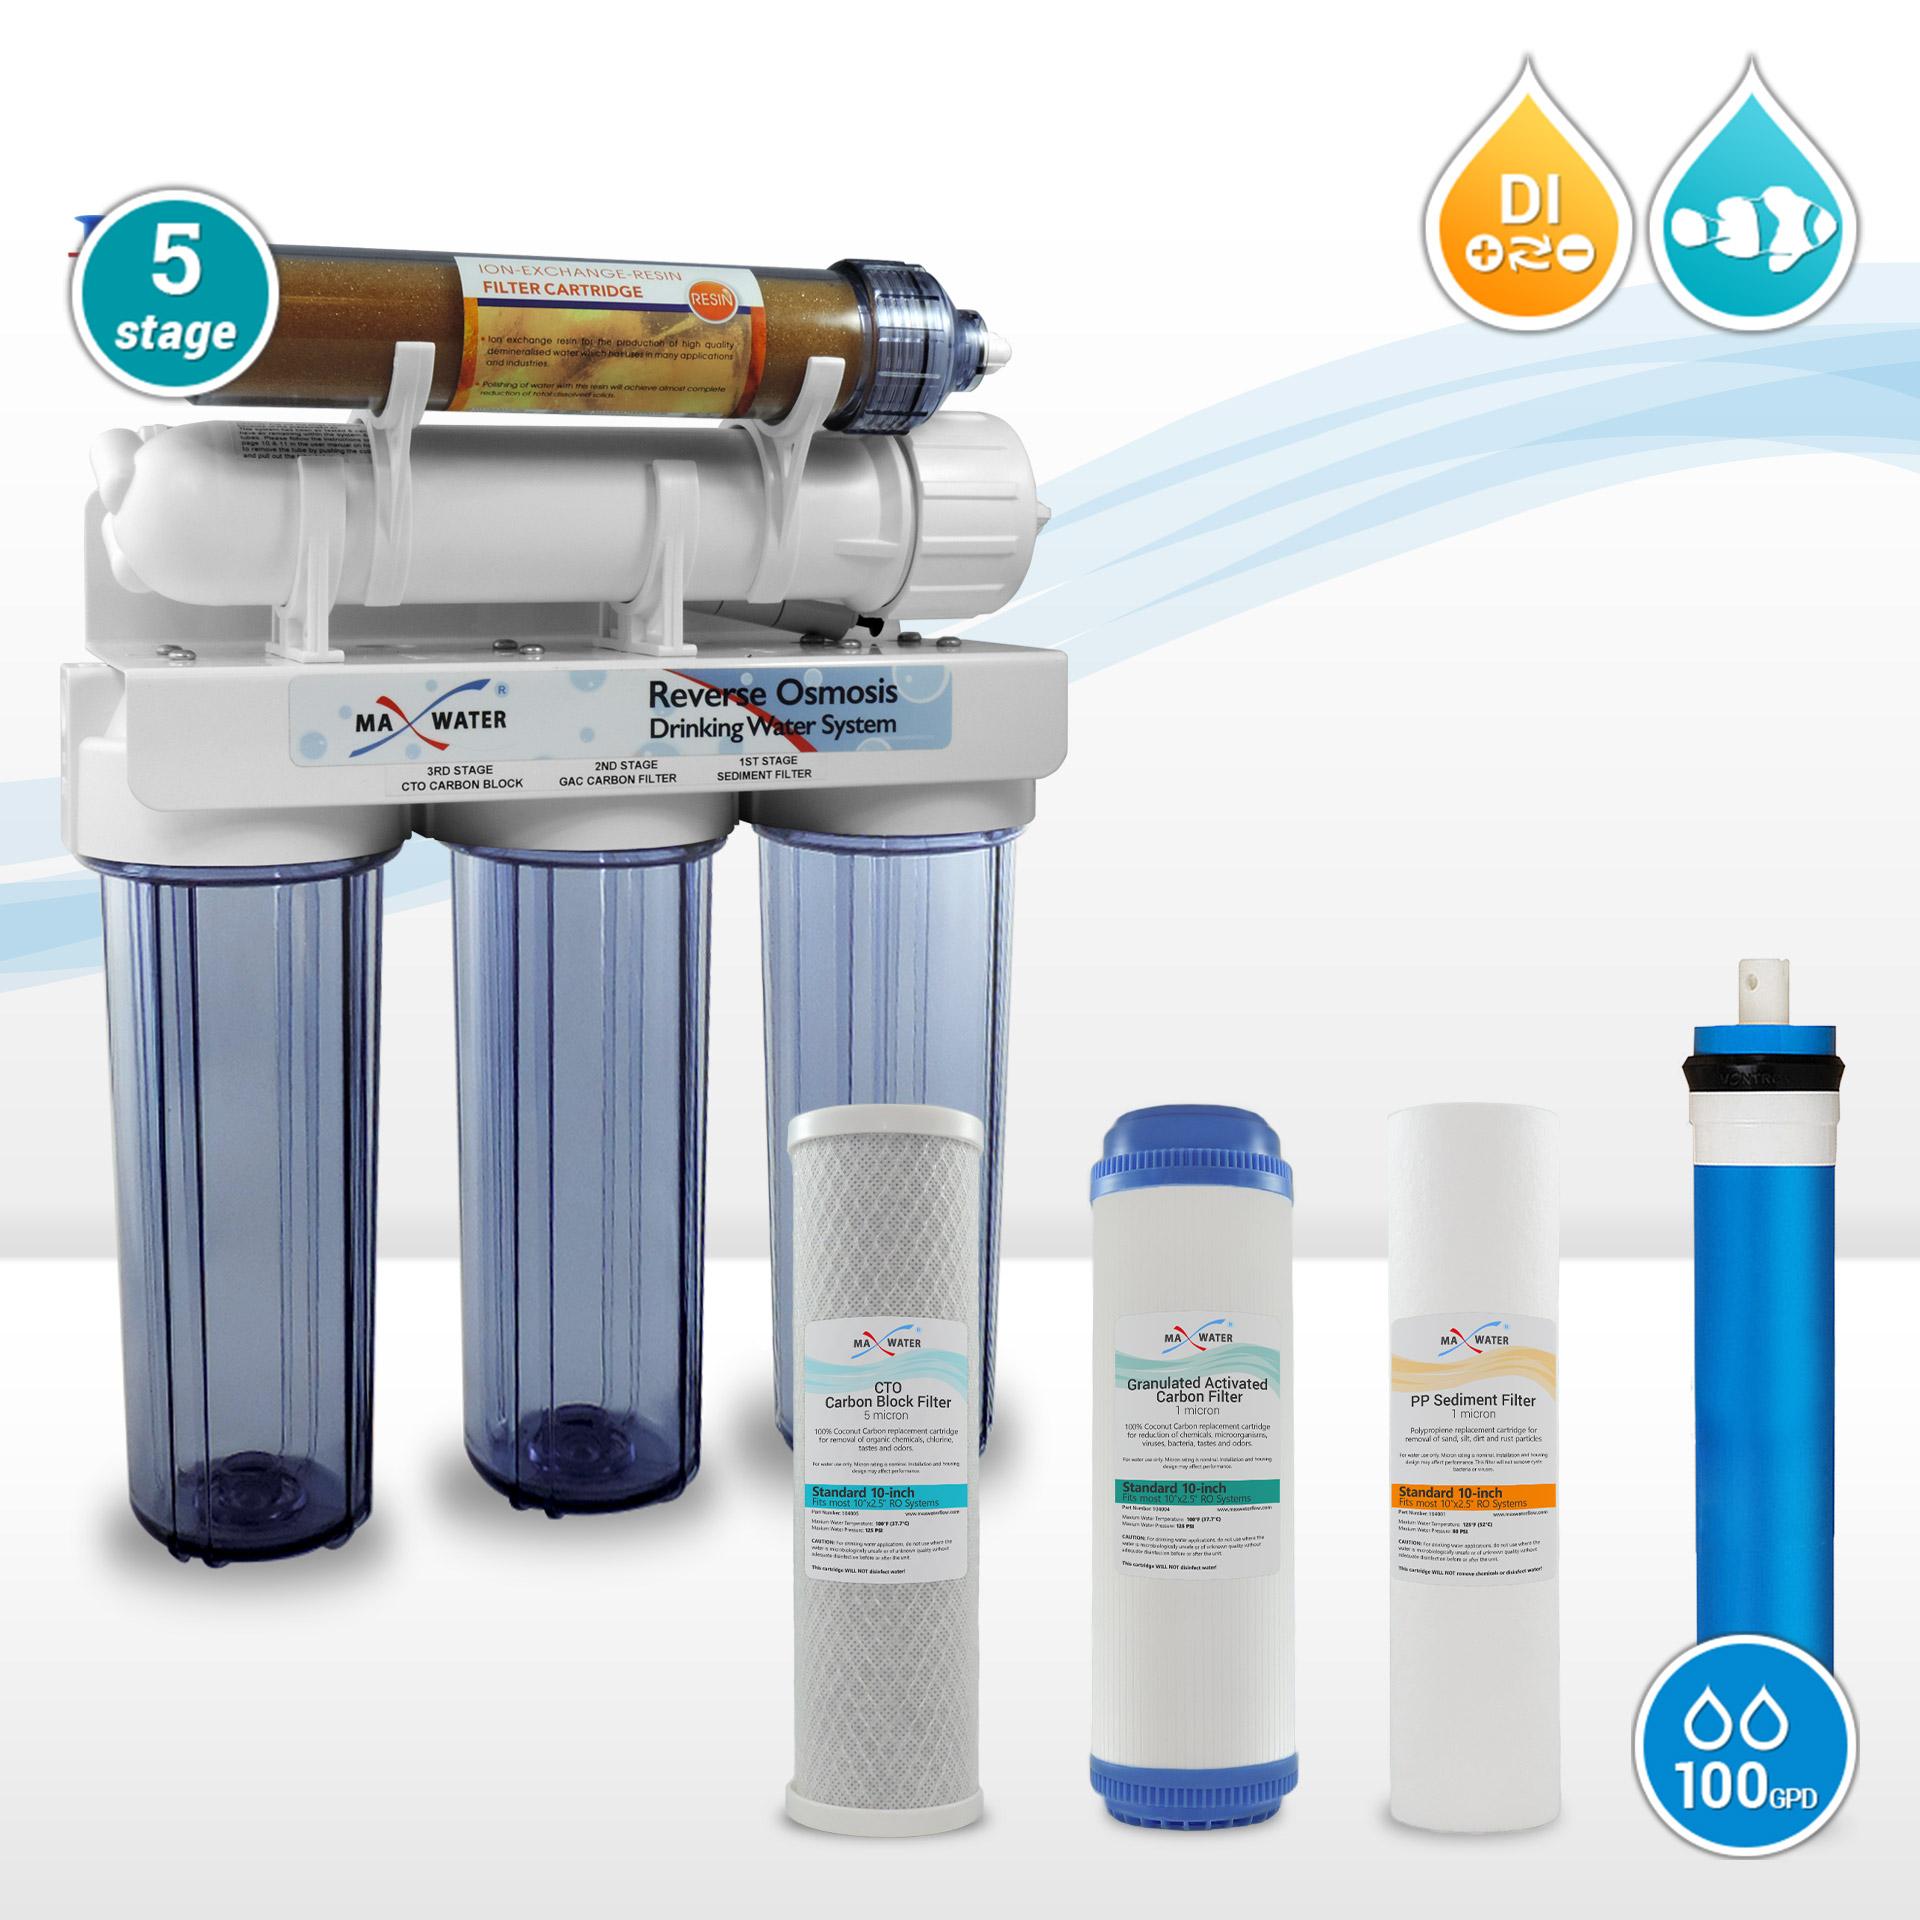 5 Stage 100gpd Reef Aquarium Reverse Osmosis Water System